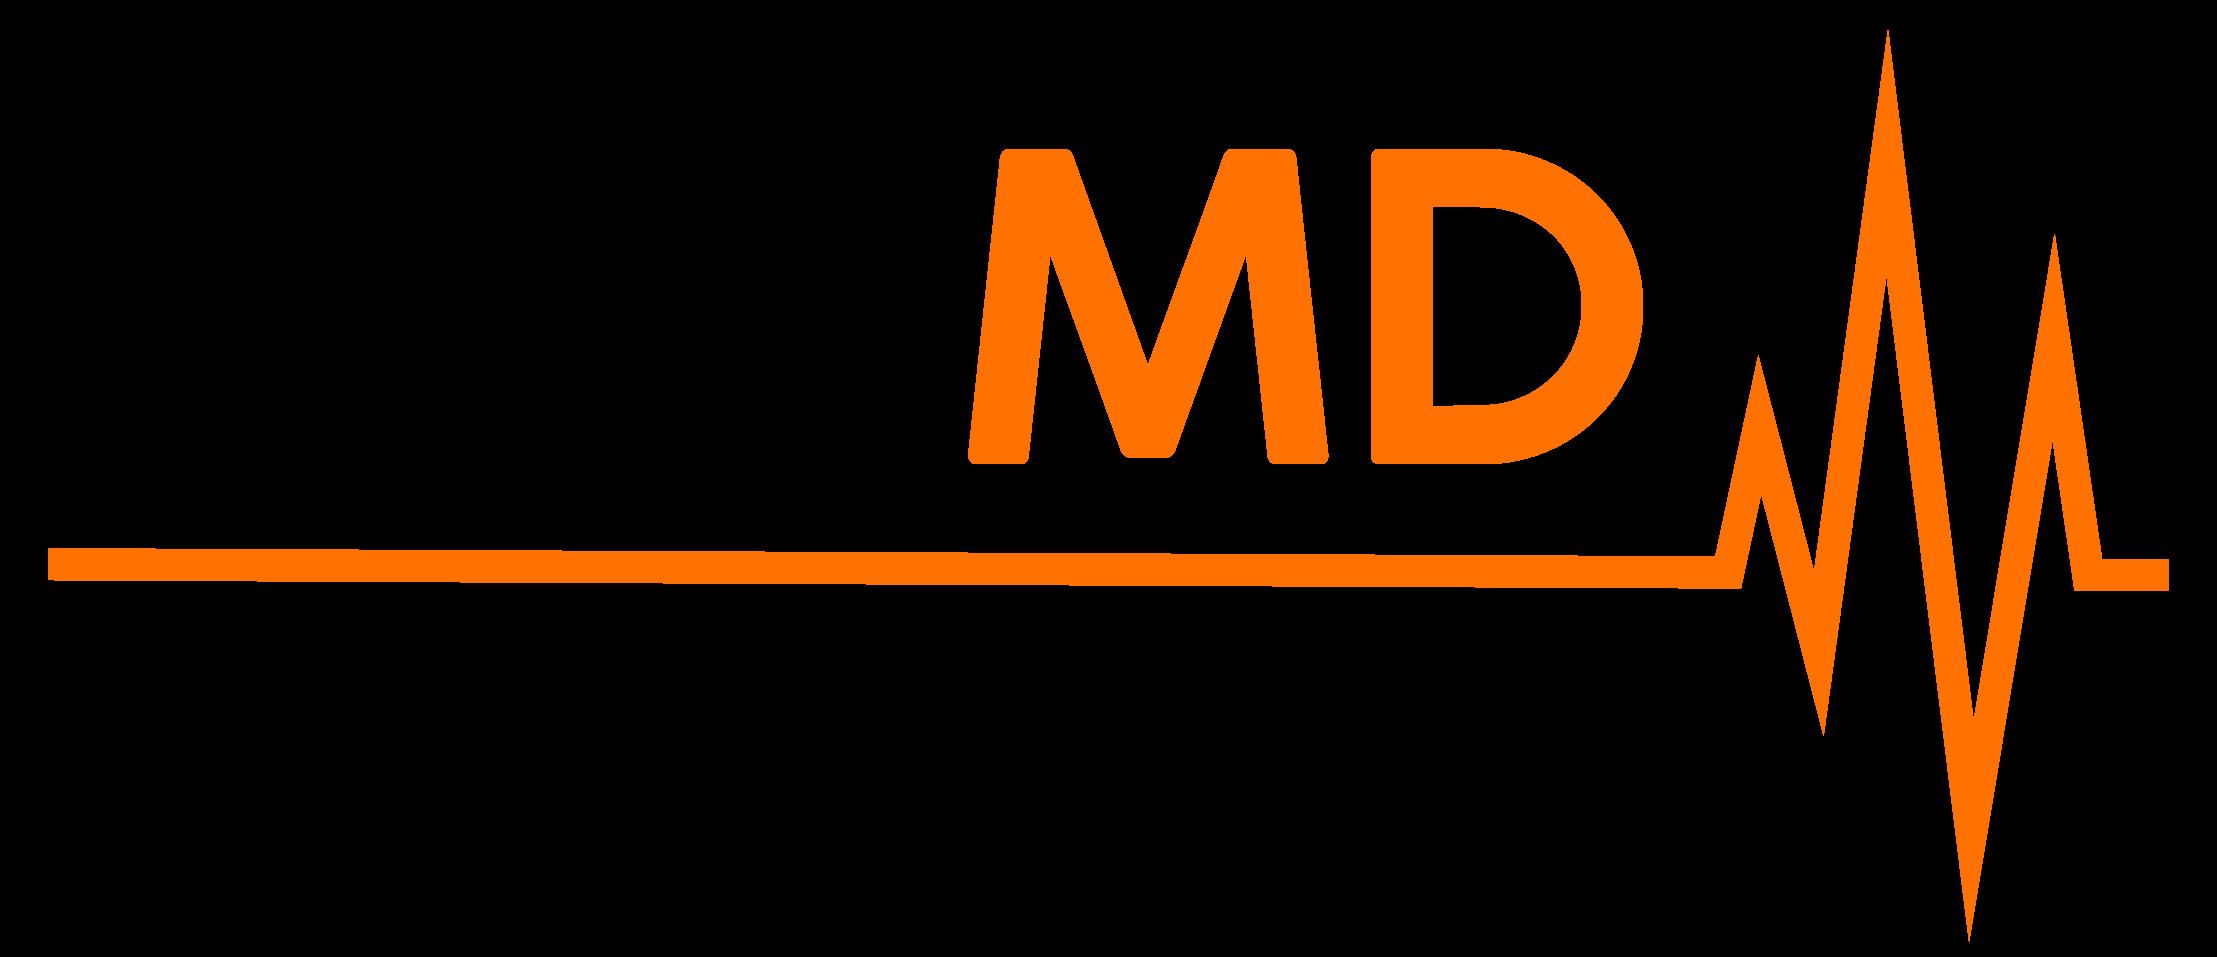 cropped-Logo-Brian-CarMD-Archivo-Editable.png